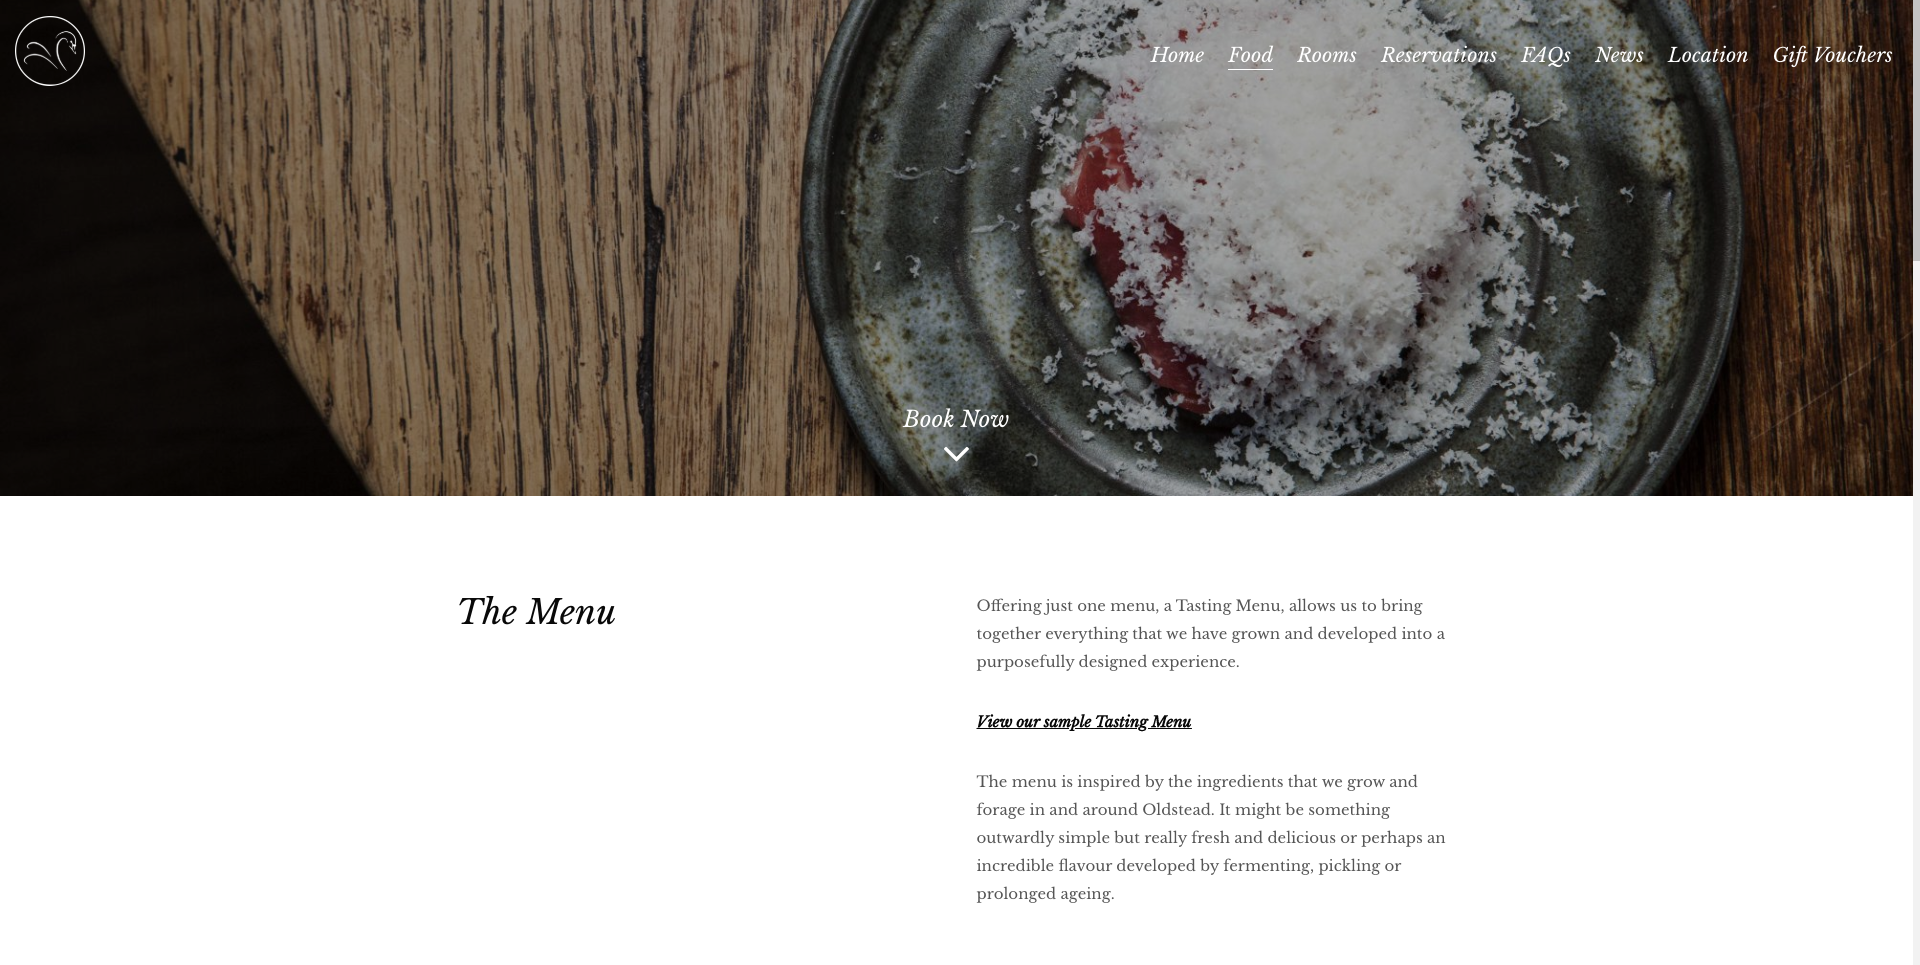 The Black Swan Restaurant Website Design